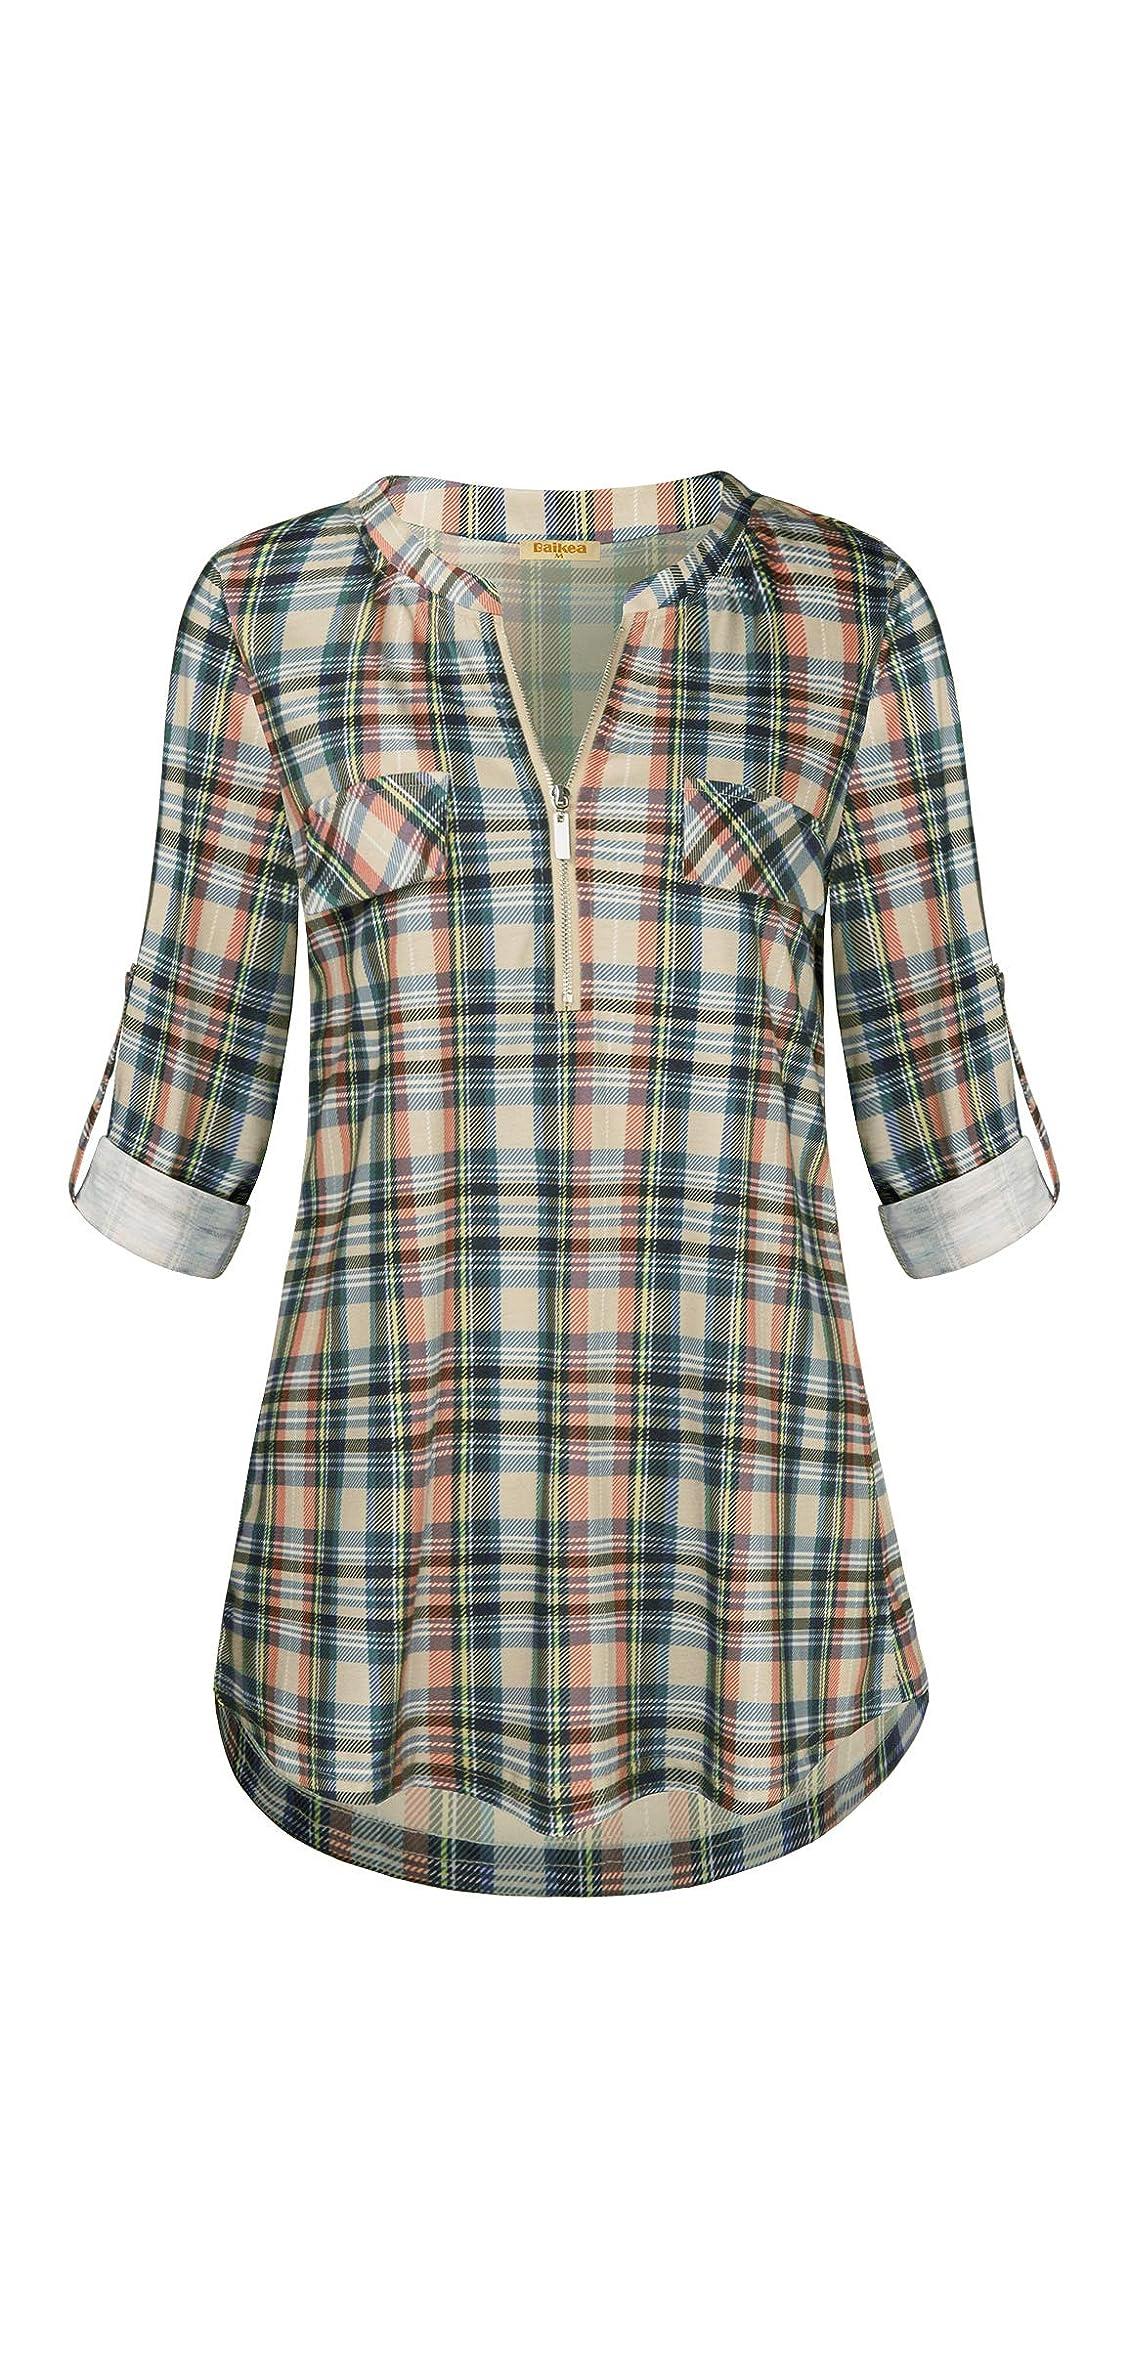 Baikea Women's / Rolled Sleeve Zipped V Neck Plaid